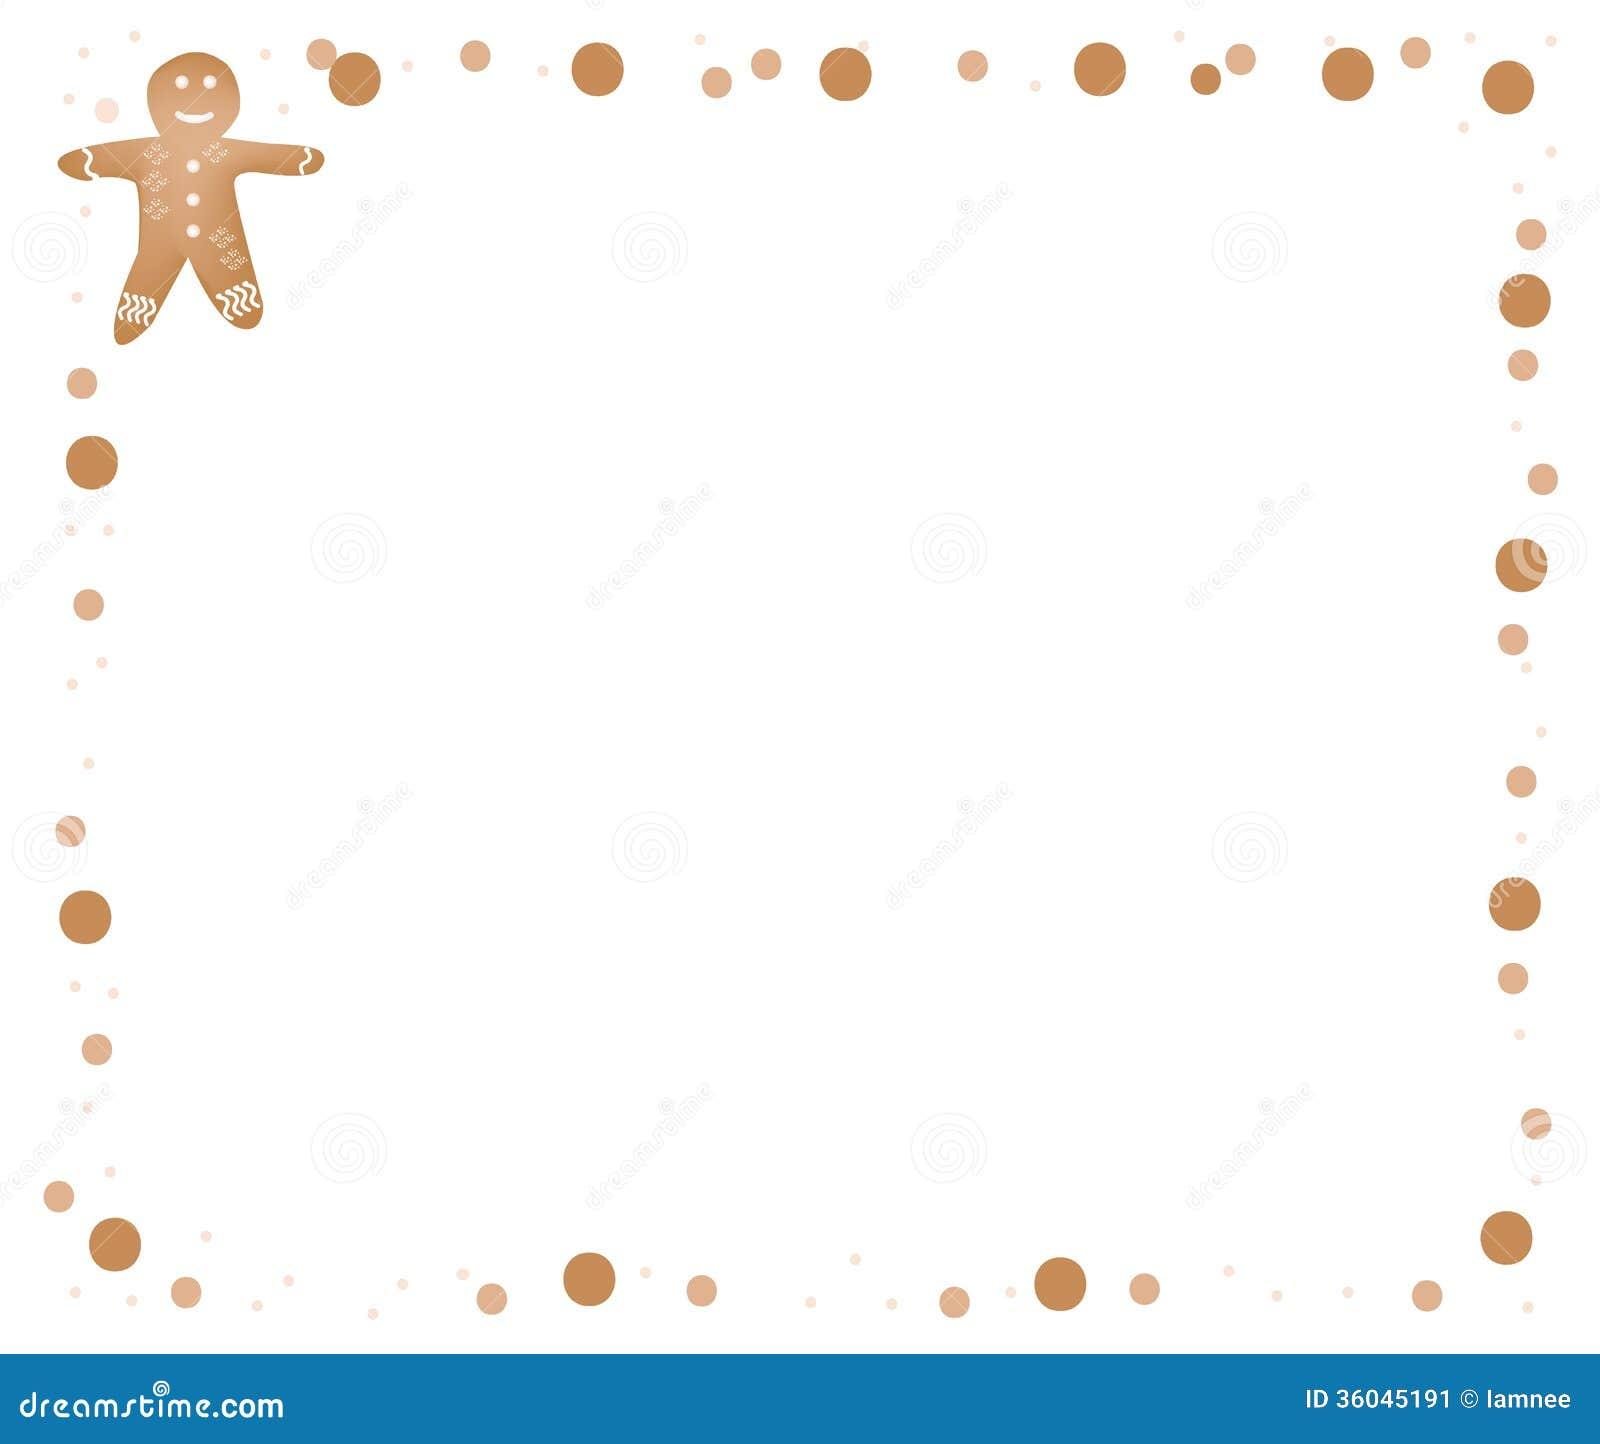 Baking border clipart gingerbread man border stock